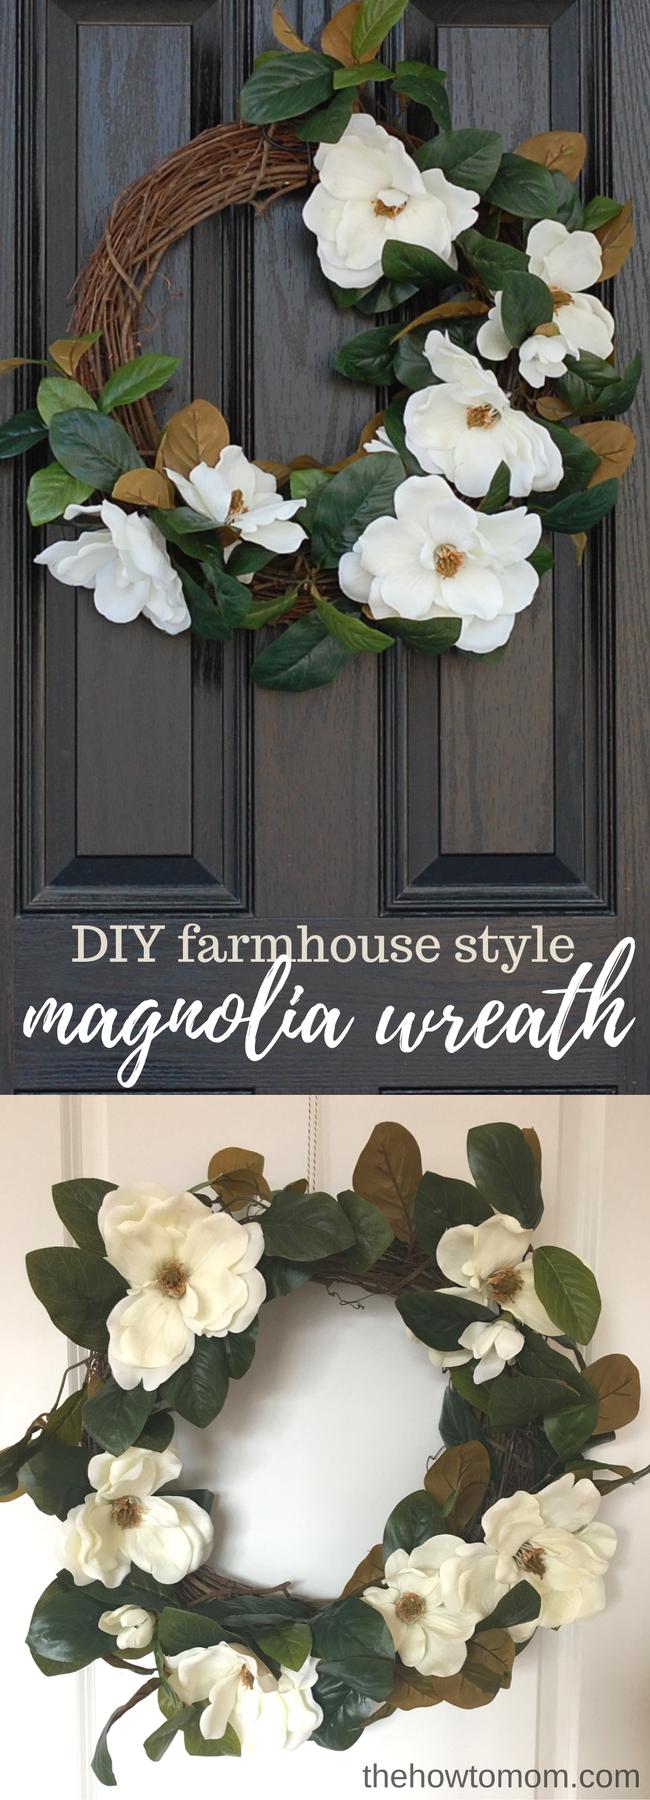 Farmhouse Style Magnolia Wreath - Easy DIY